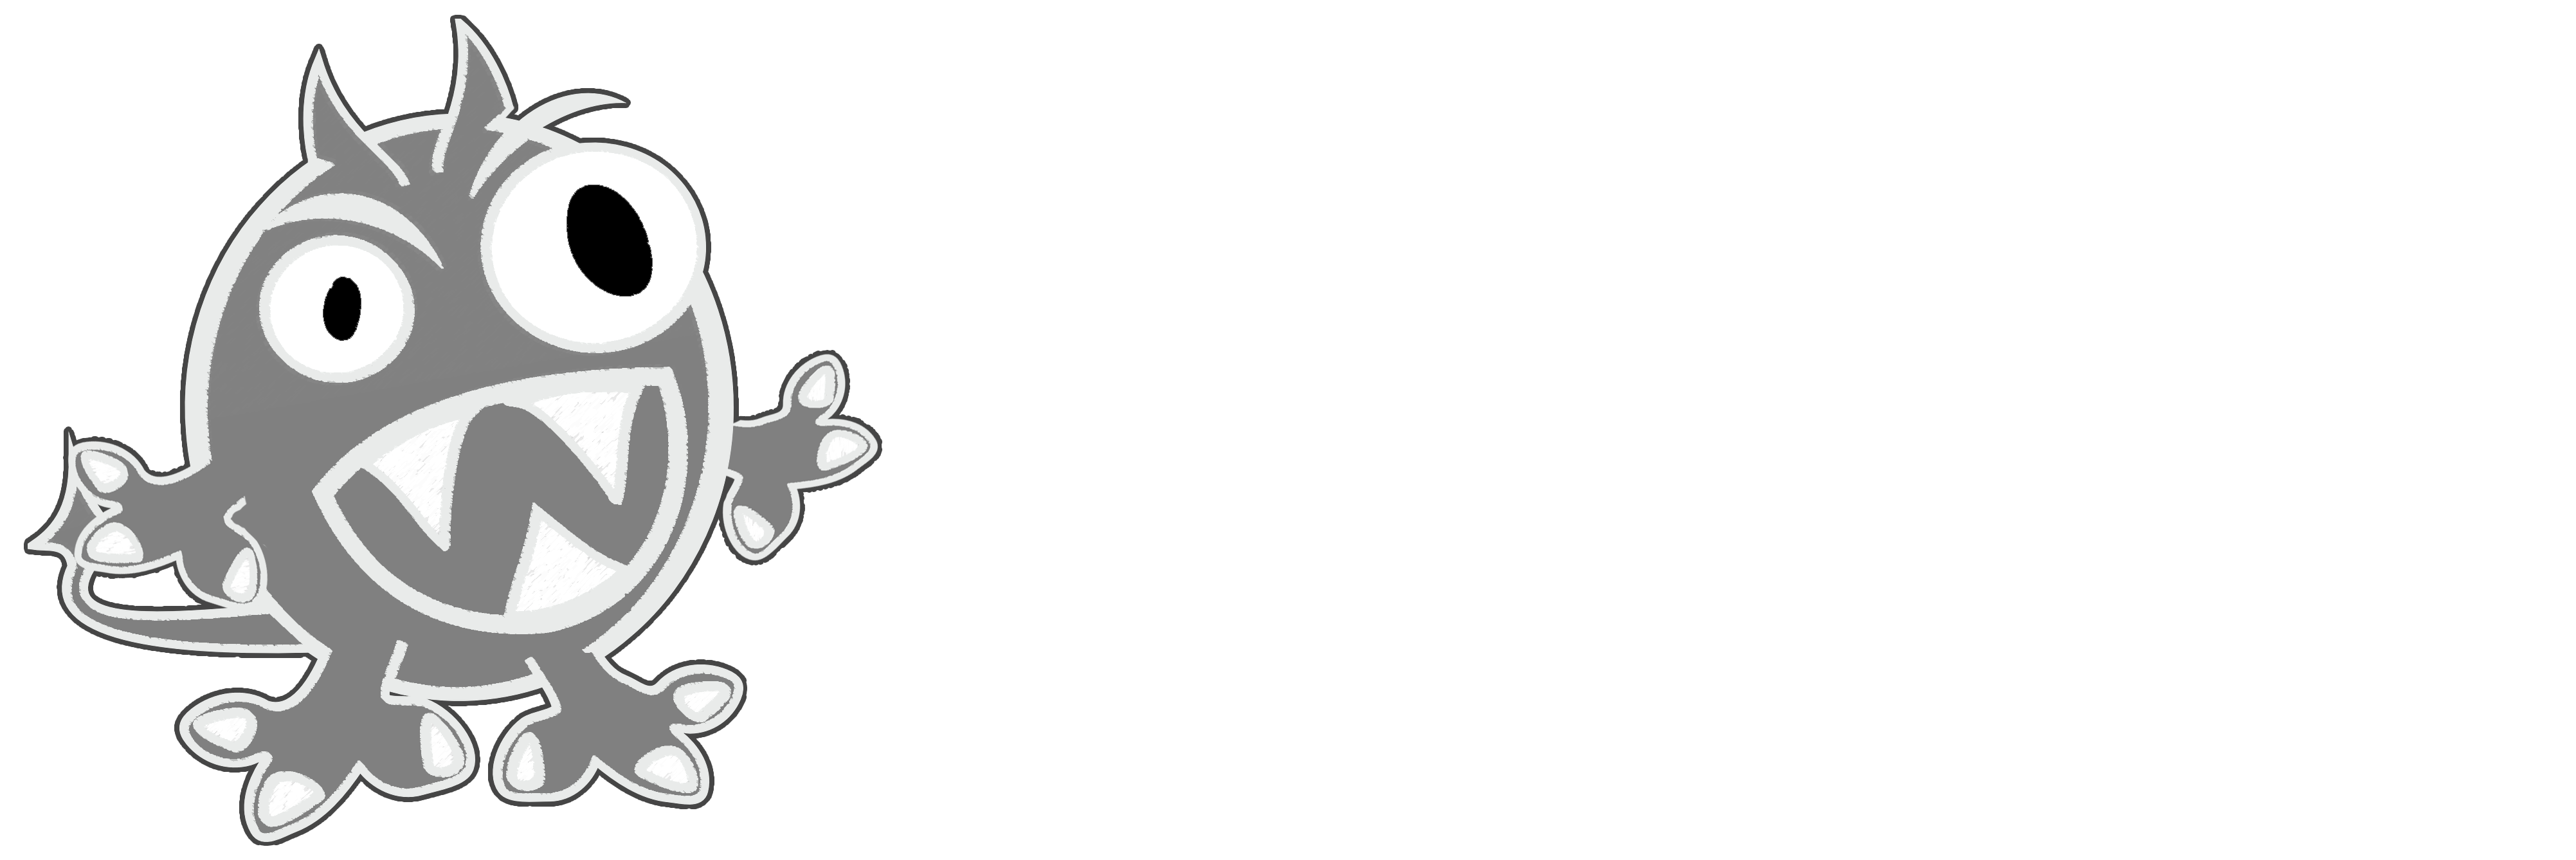 Banini: Legend of Alec